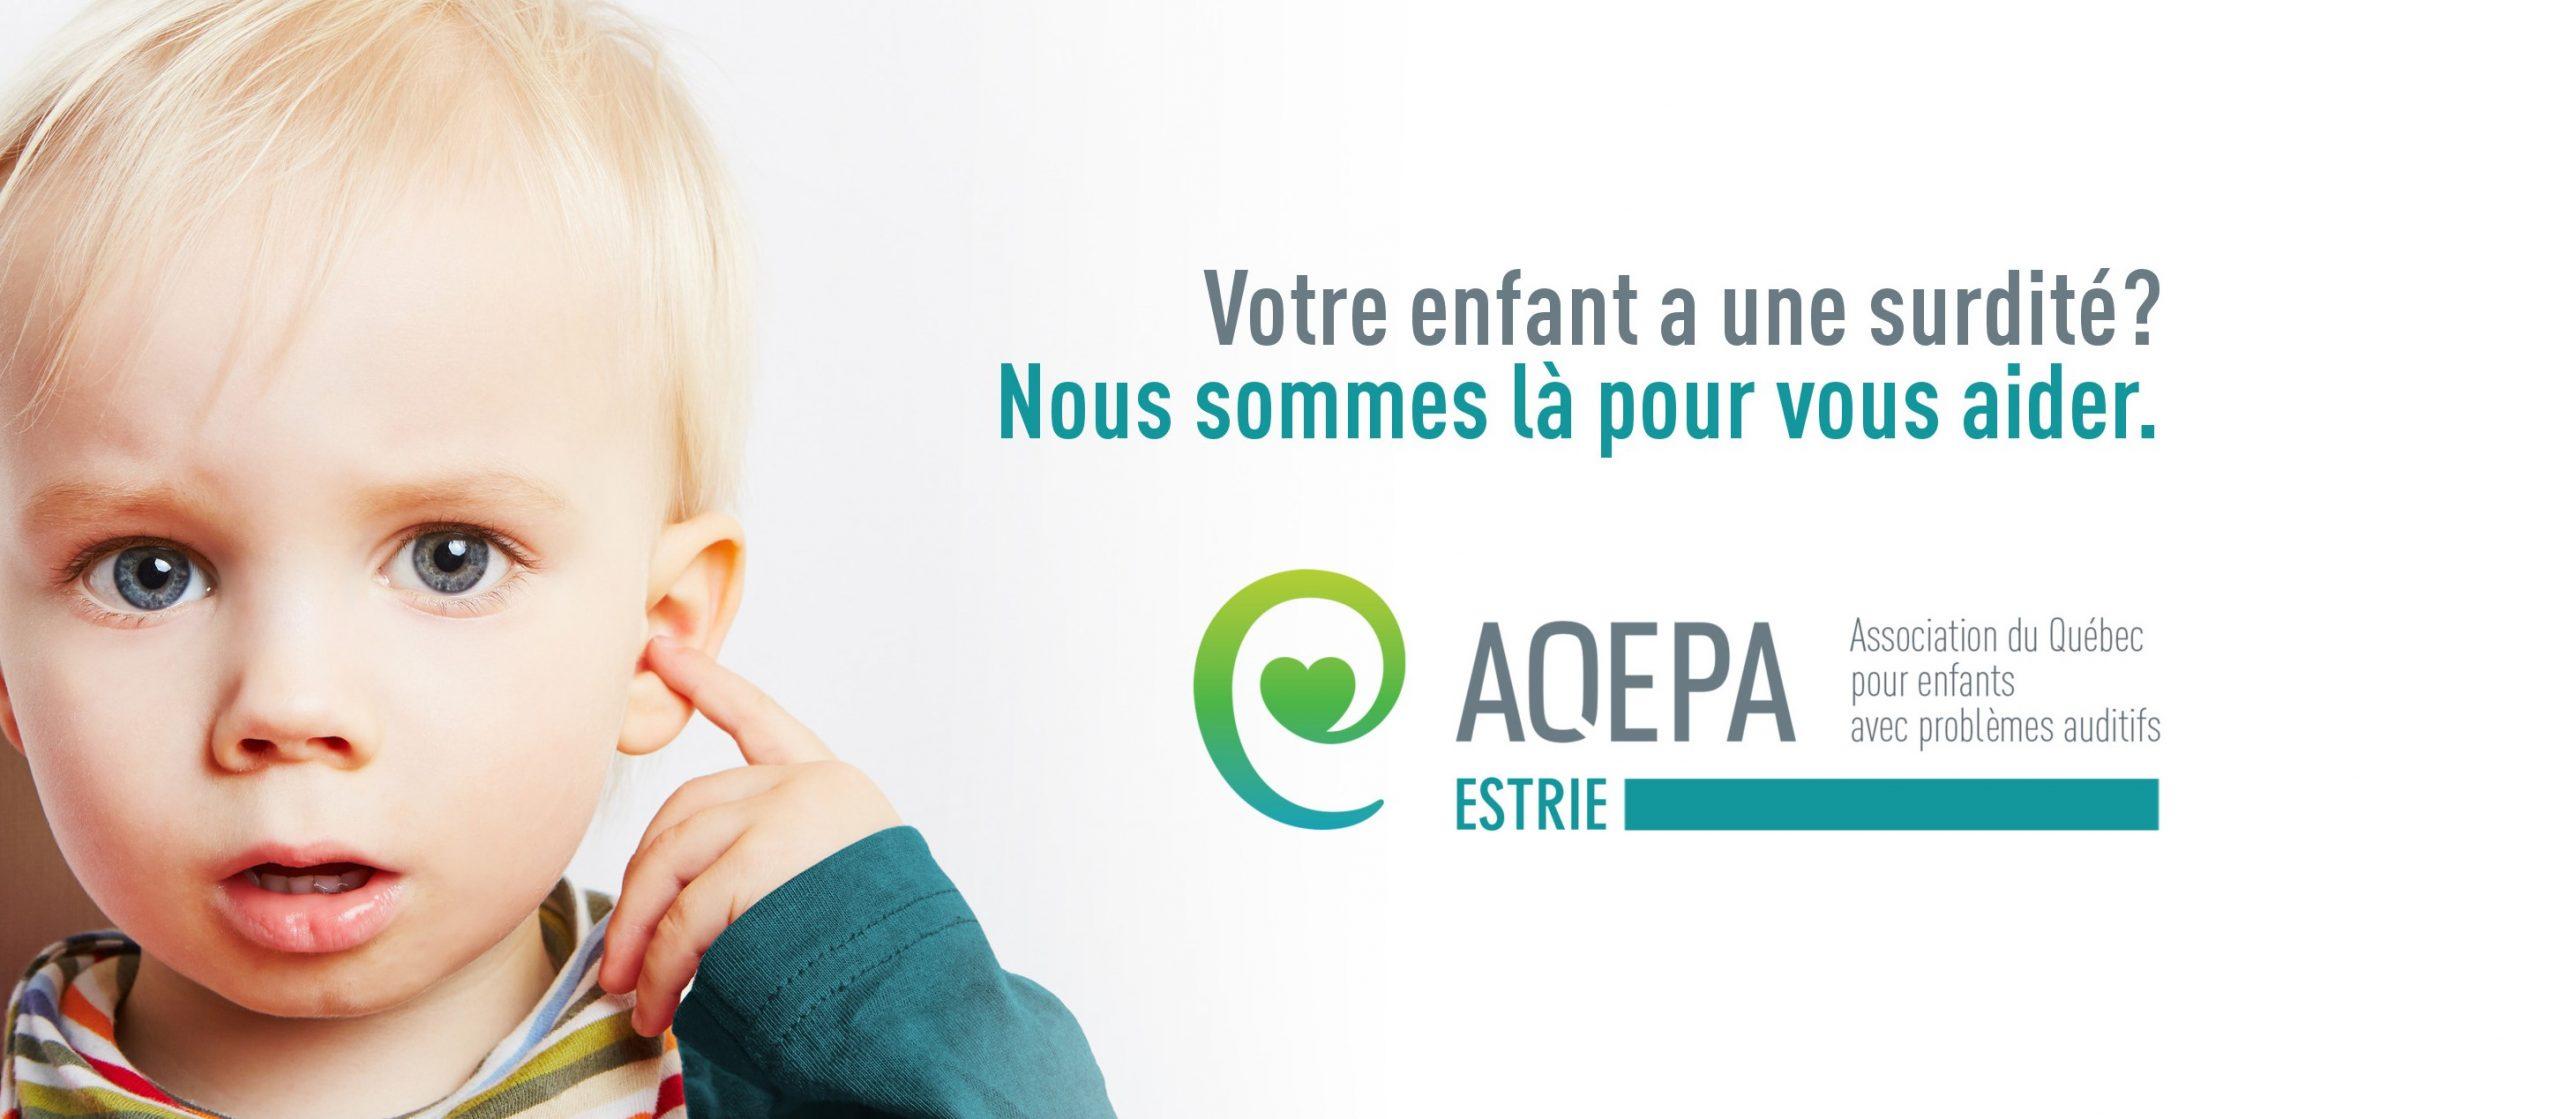 couv facebook AQEPA estrie